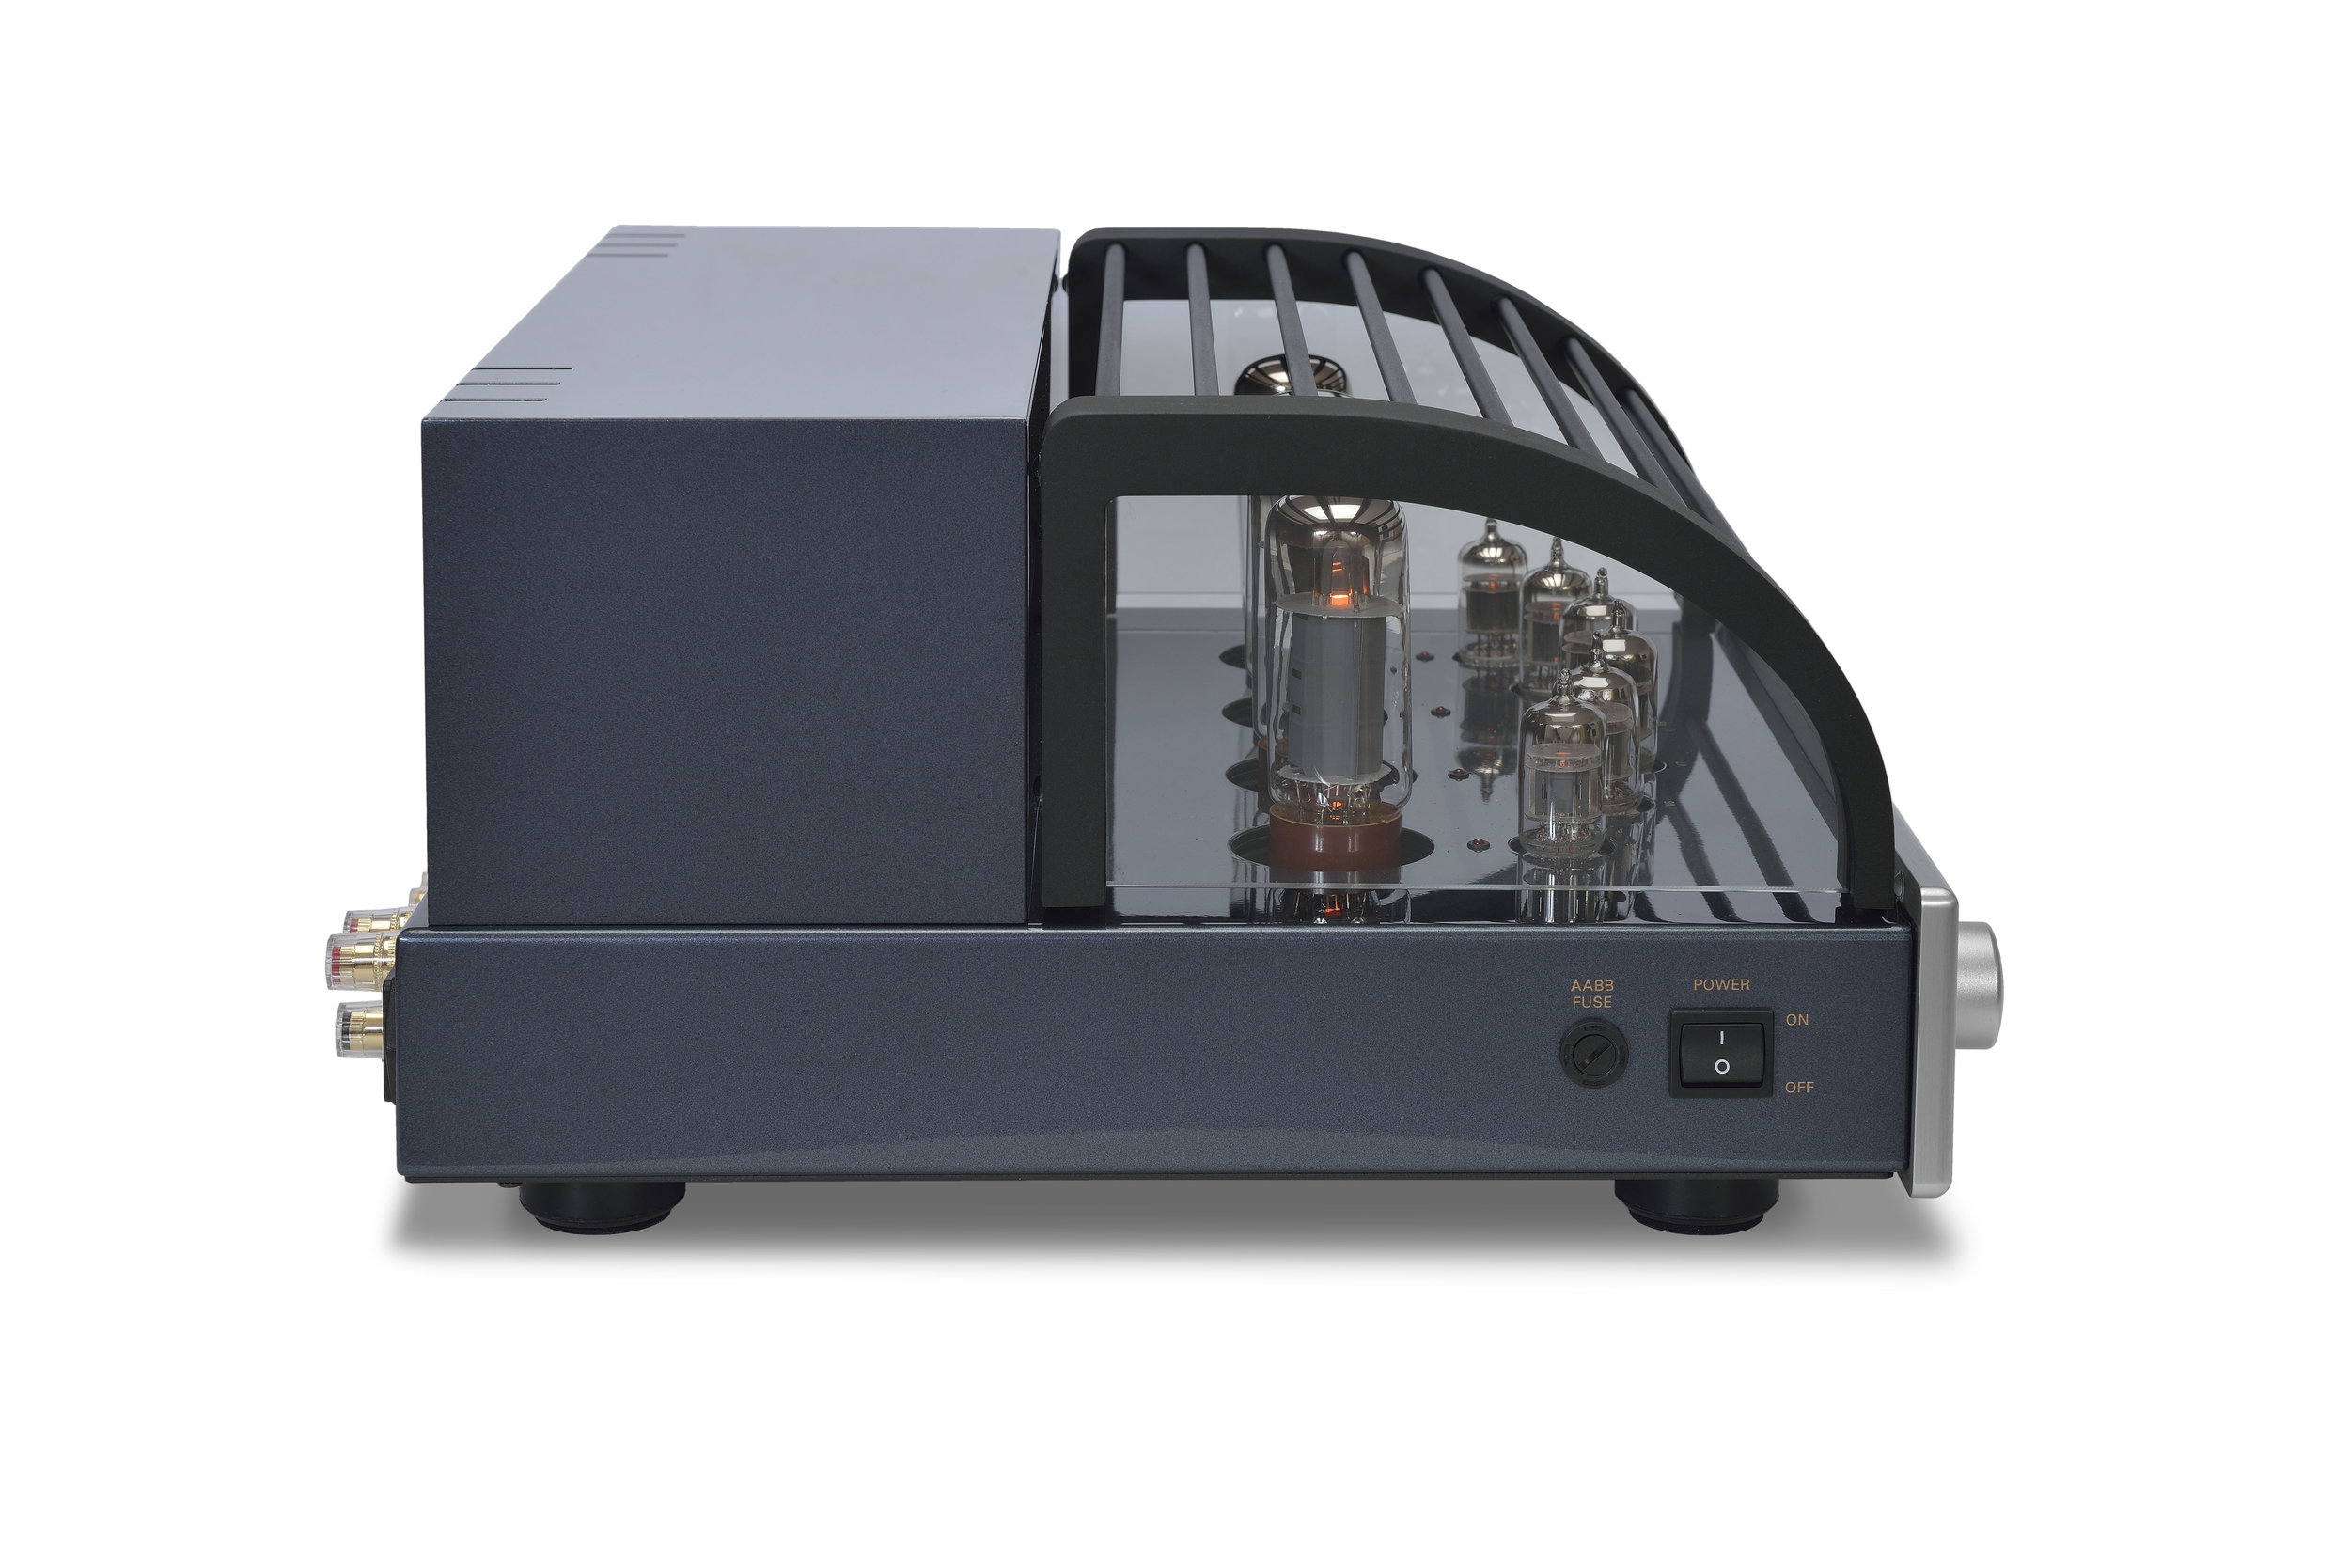 046b - PrimaLuna Evo 300 Tube Integrated Amplifier - silver - quarter turned - white background - kopie.jpg